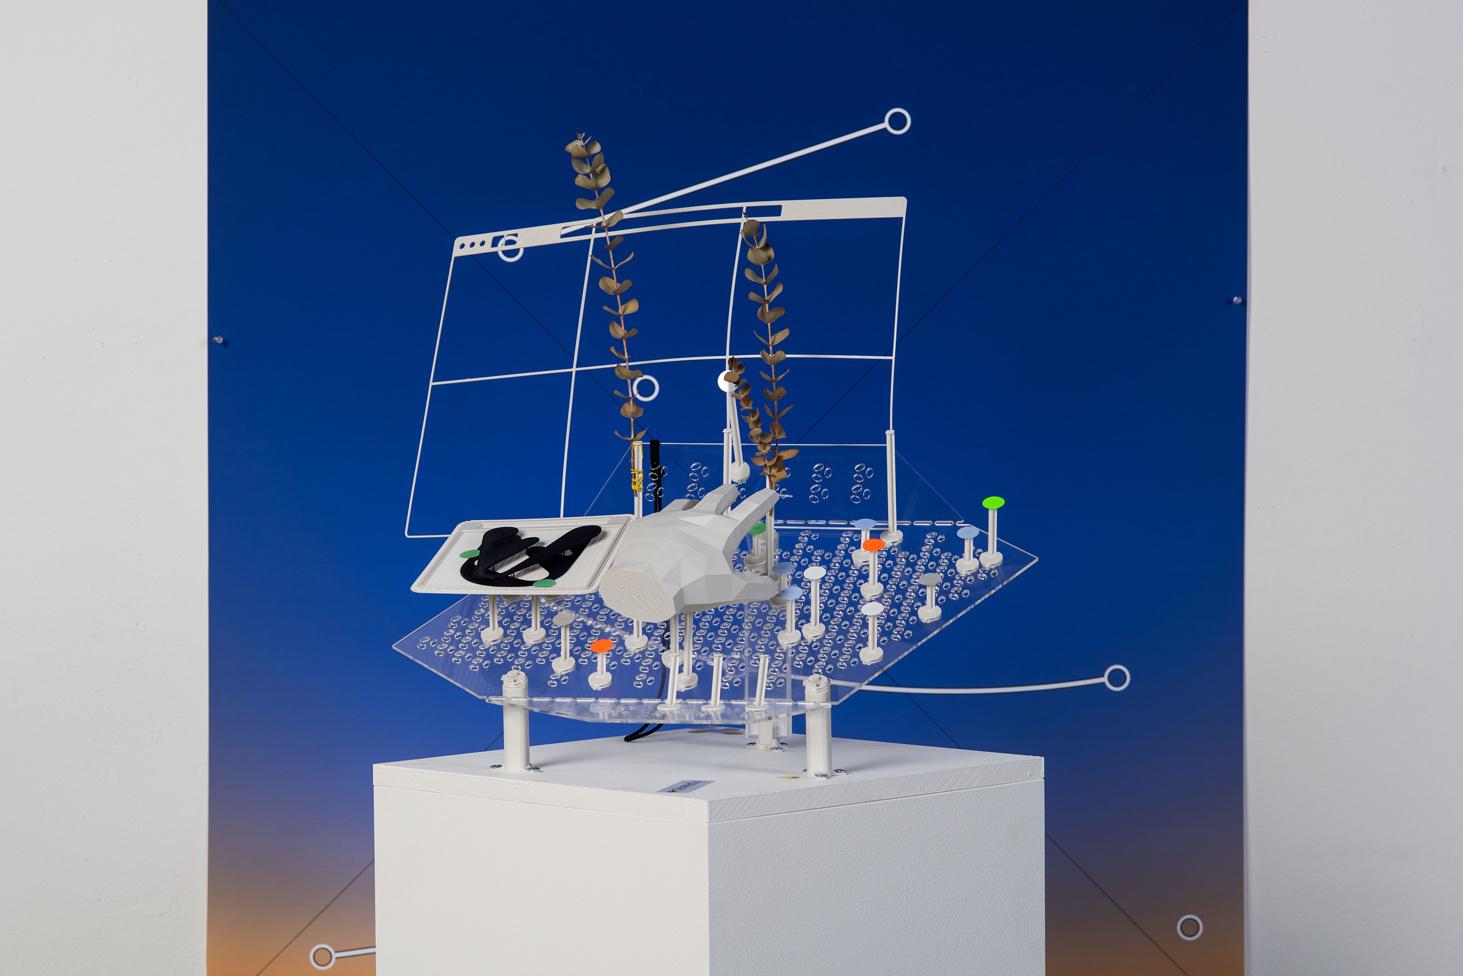 futuristic model clear screen hand controls blue background